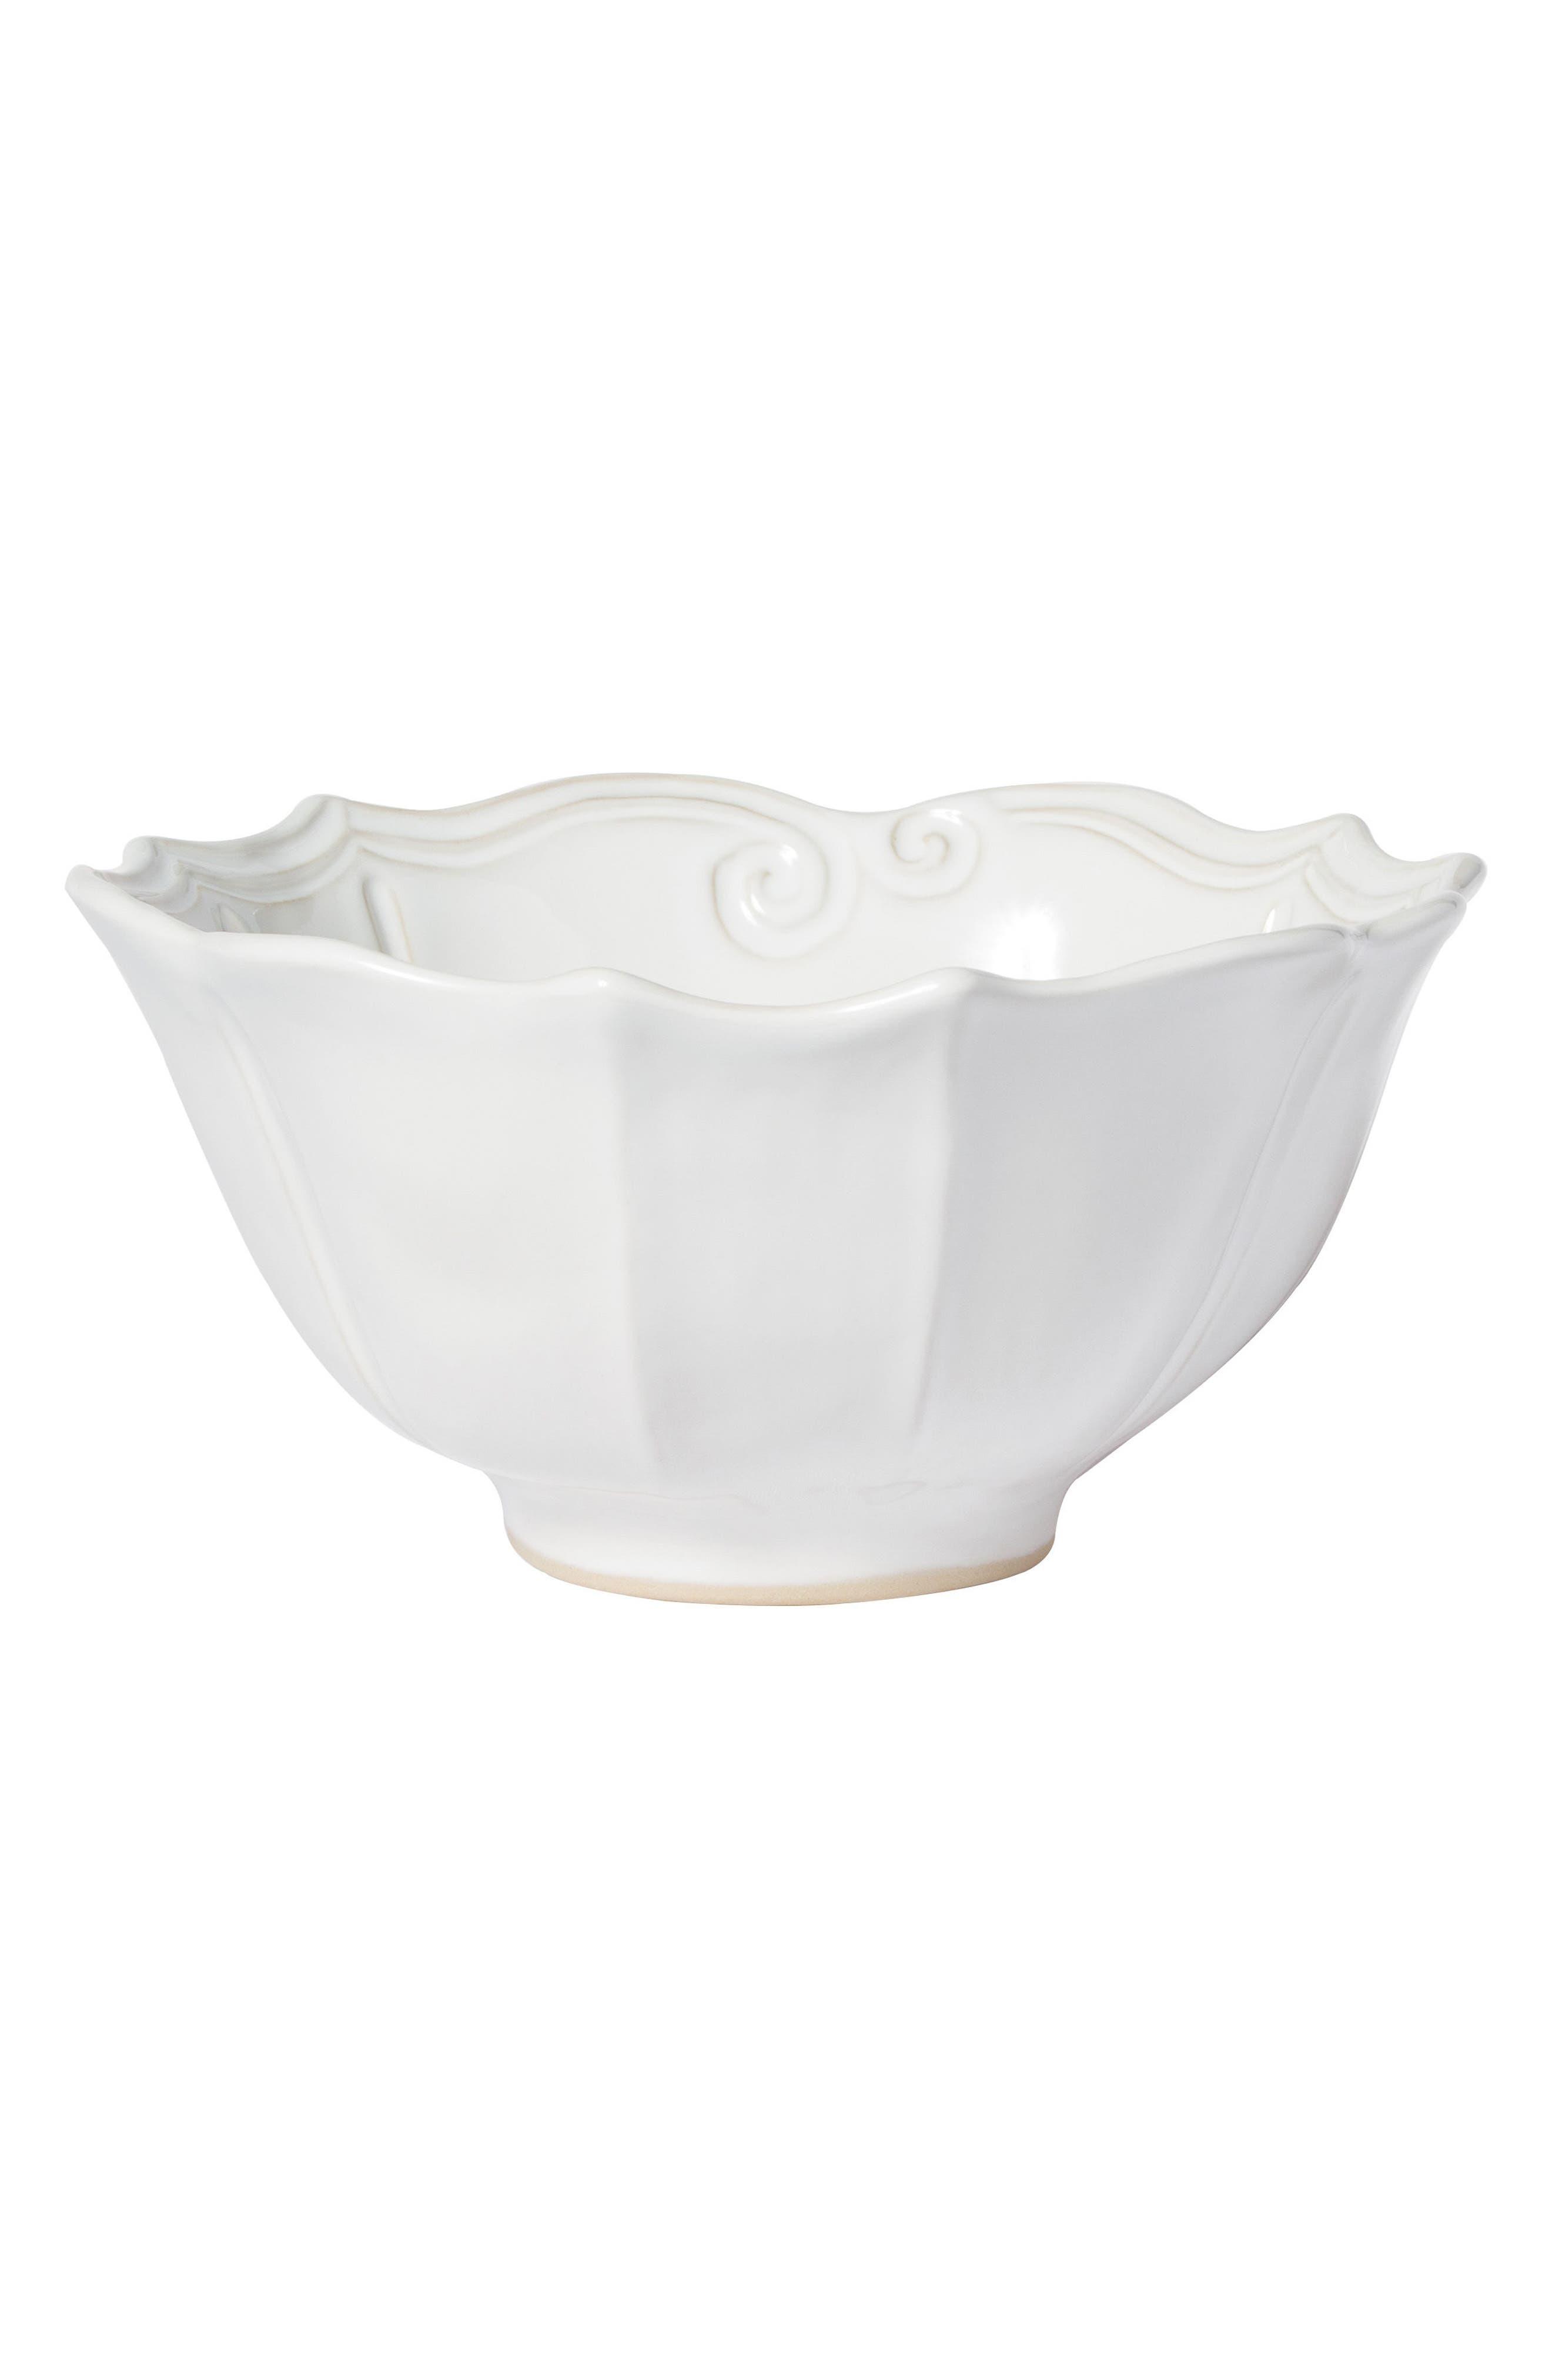 Incanto Stone Baroque Medium Serving Bowl,                             Main thumbnail 1, color,                             WHITE